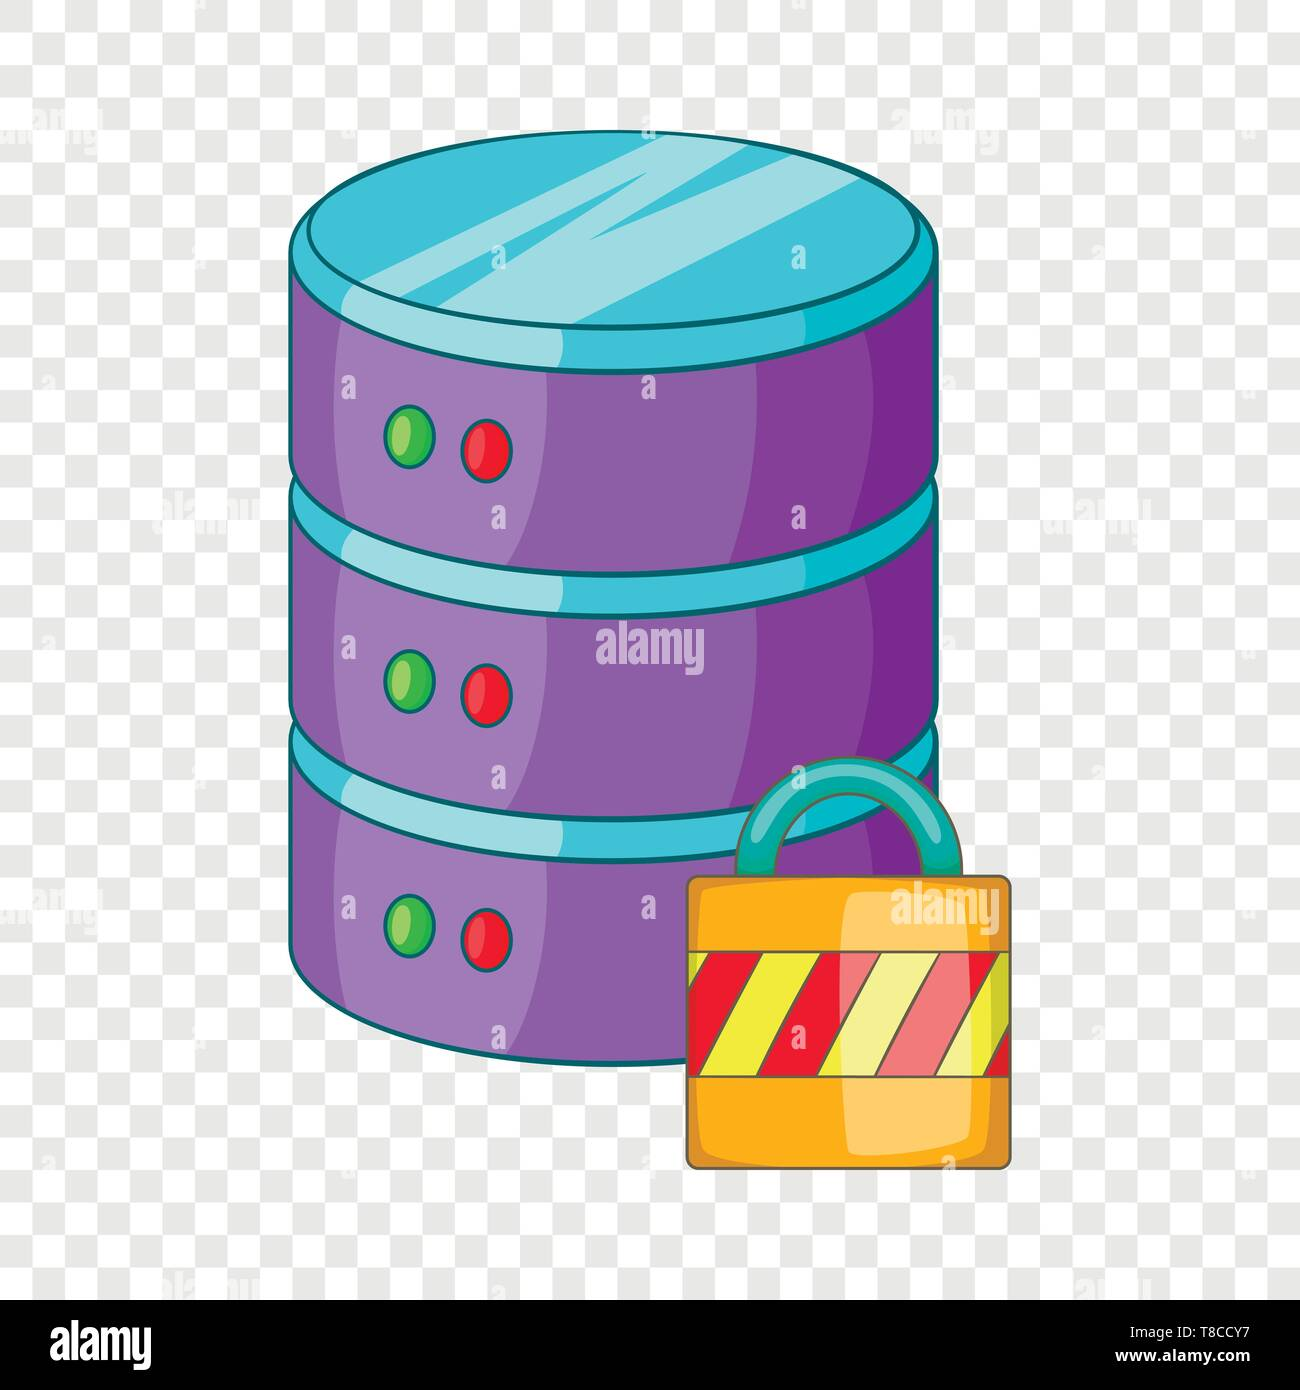 Data storage security icon, cartoon style - Stock Image